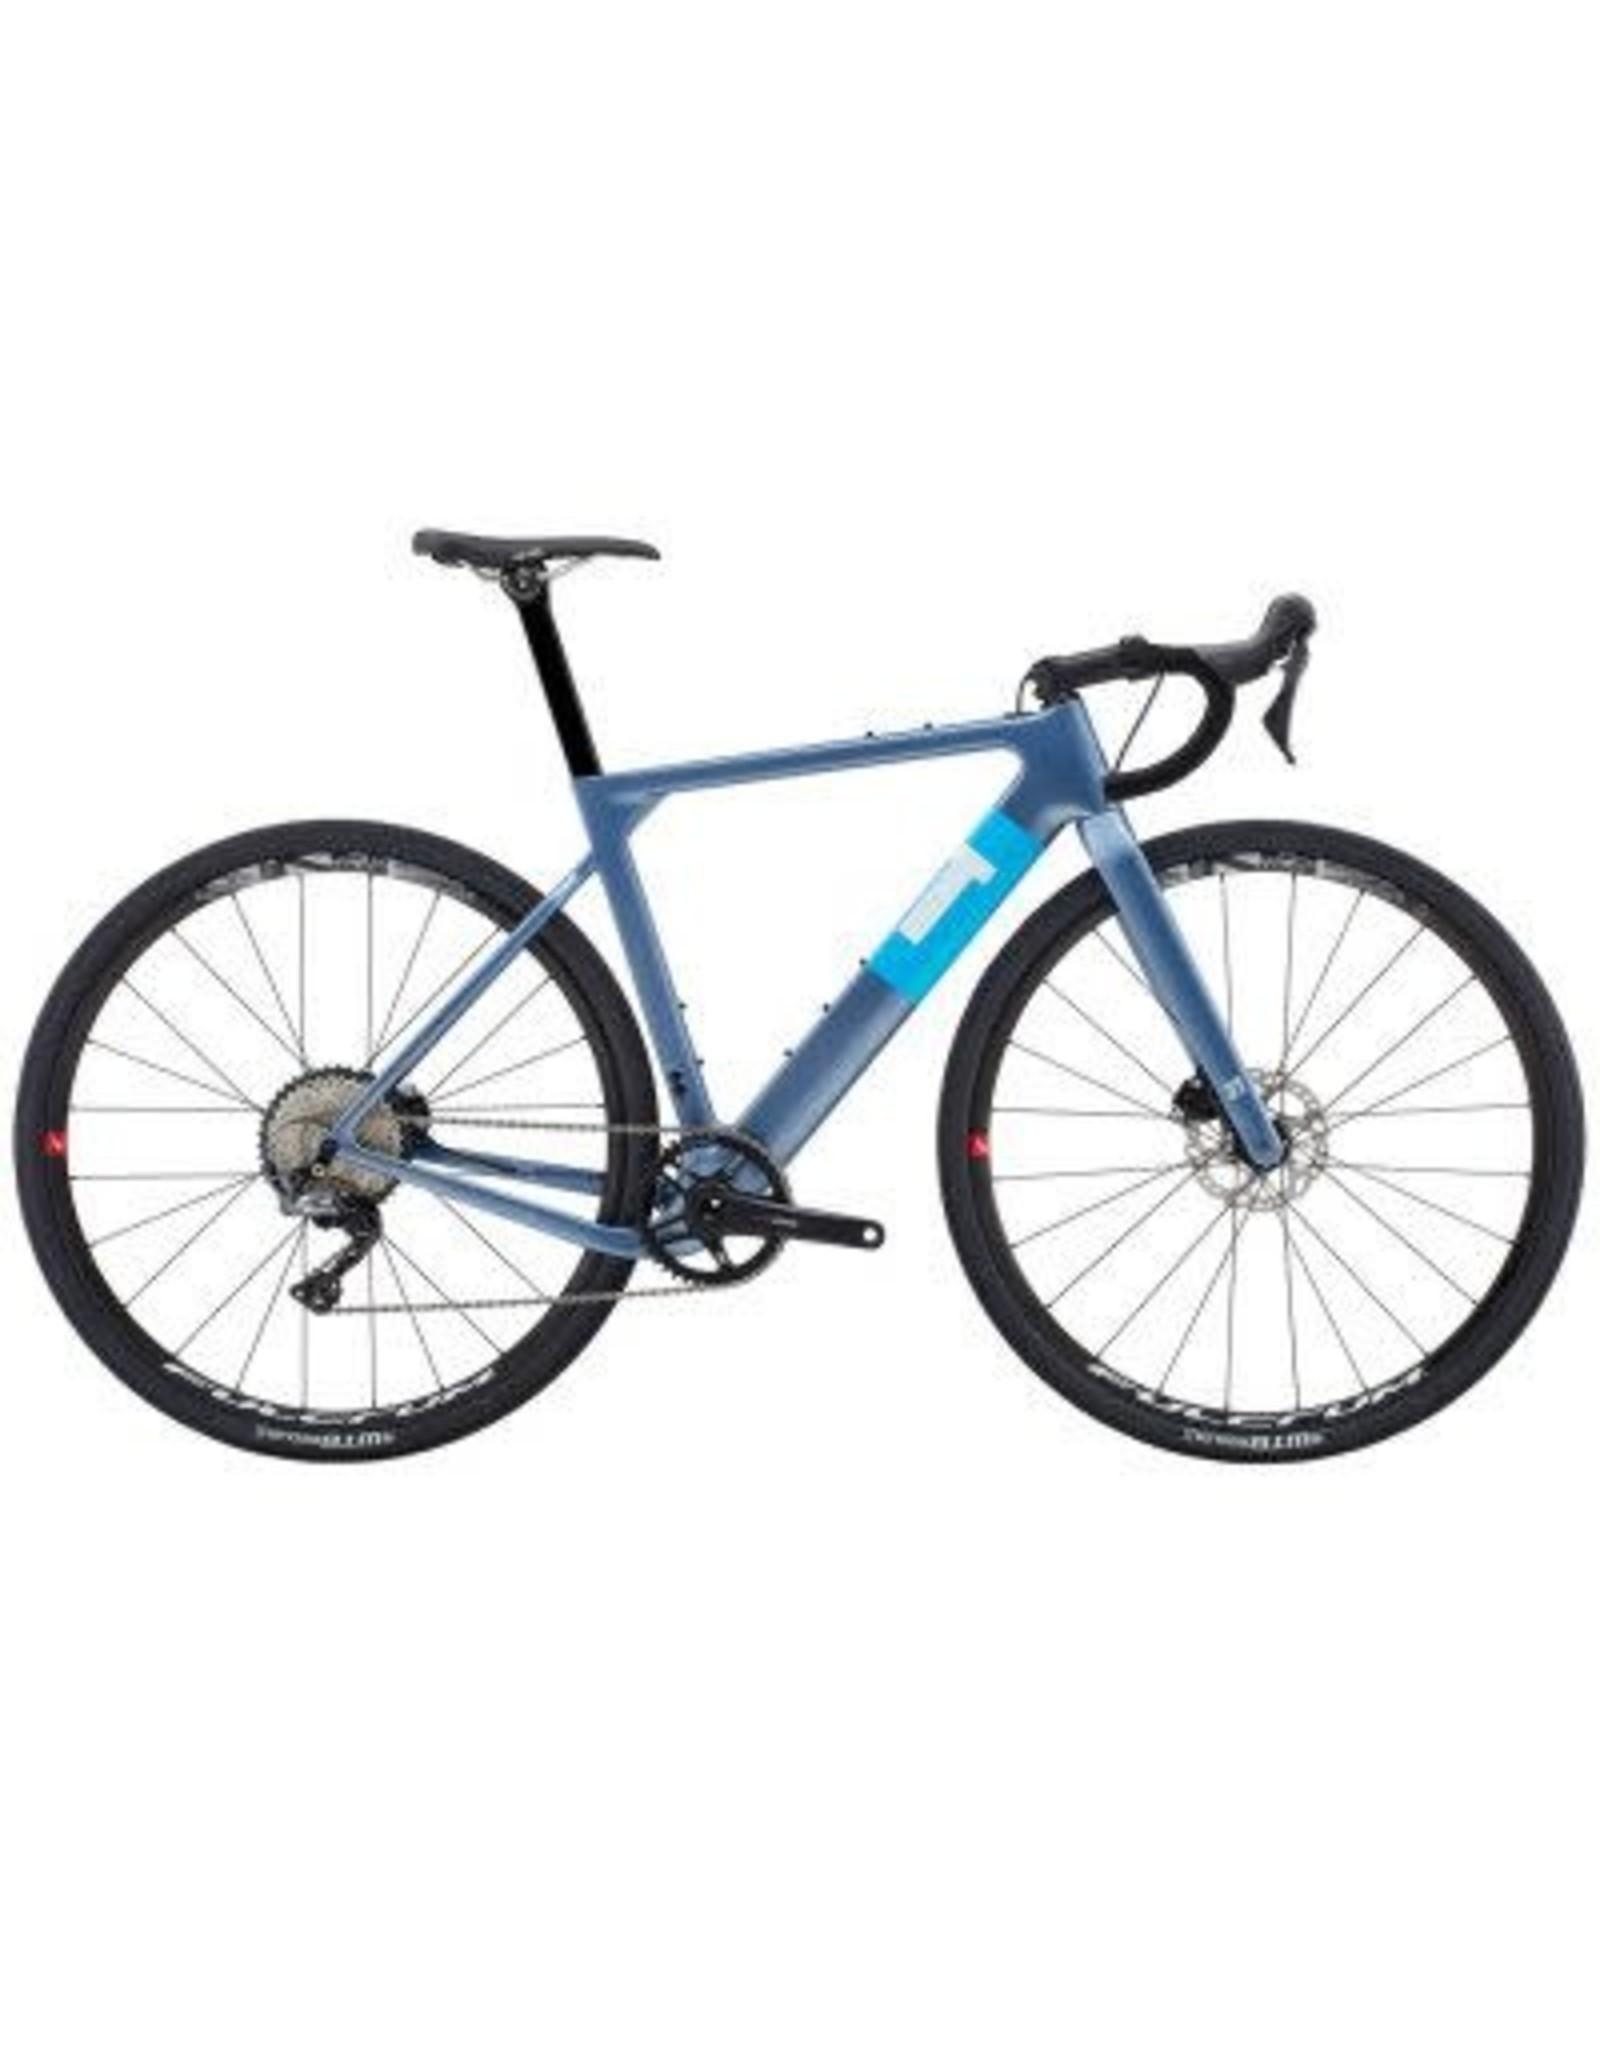 3T CYCLING 3T, Exploro GRX